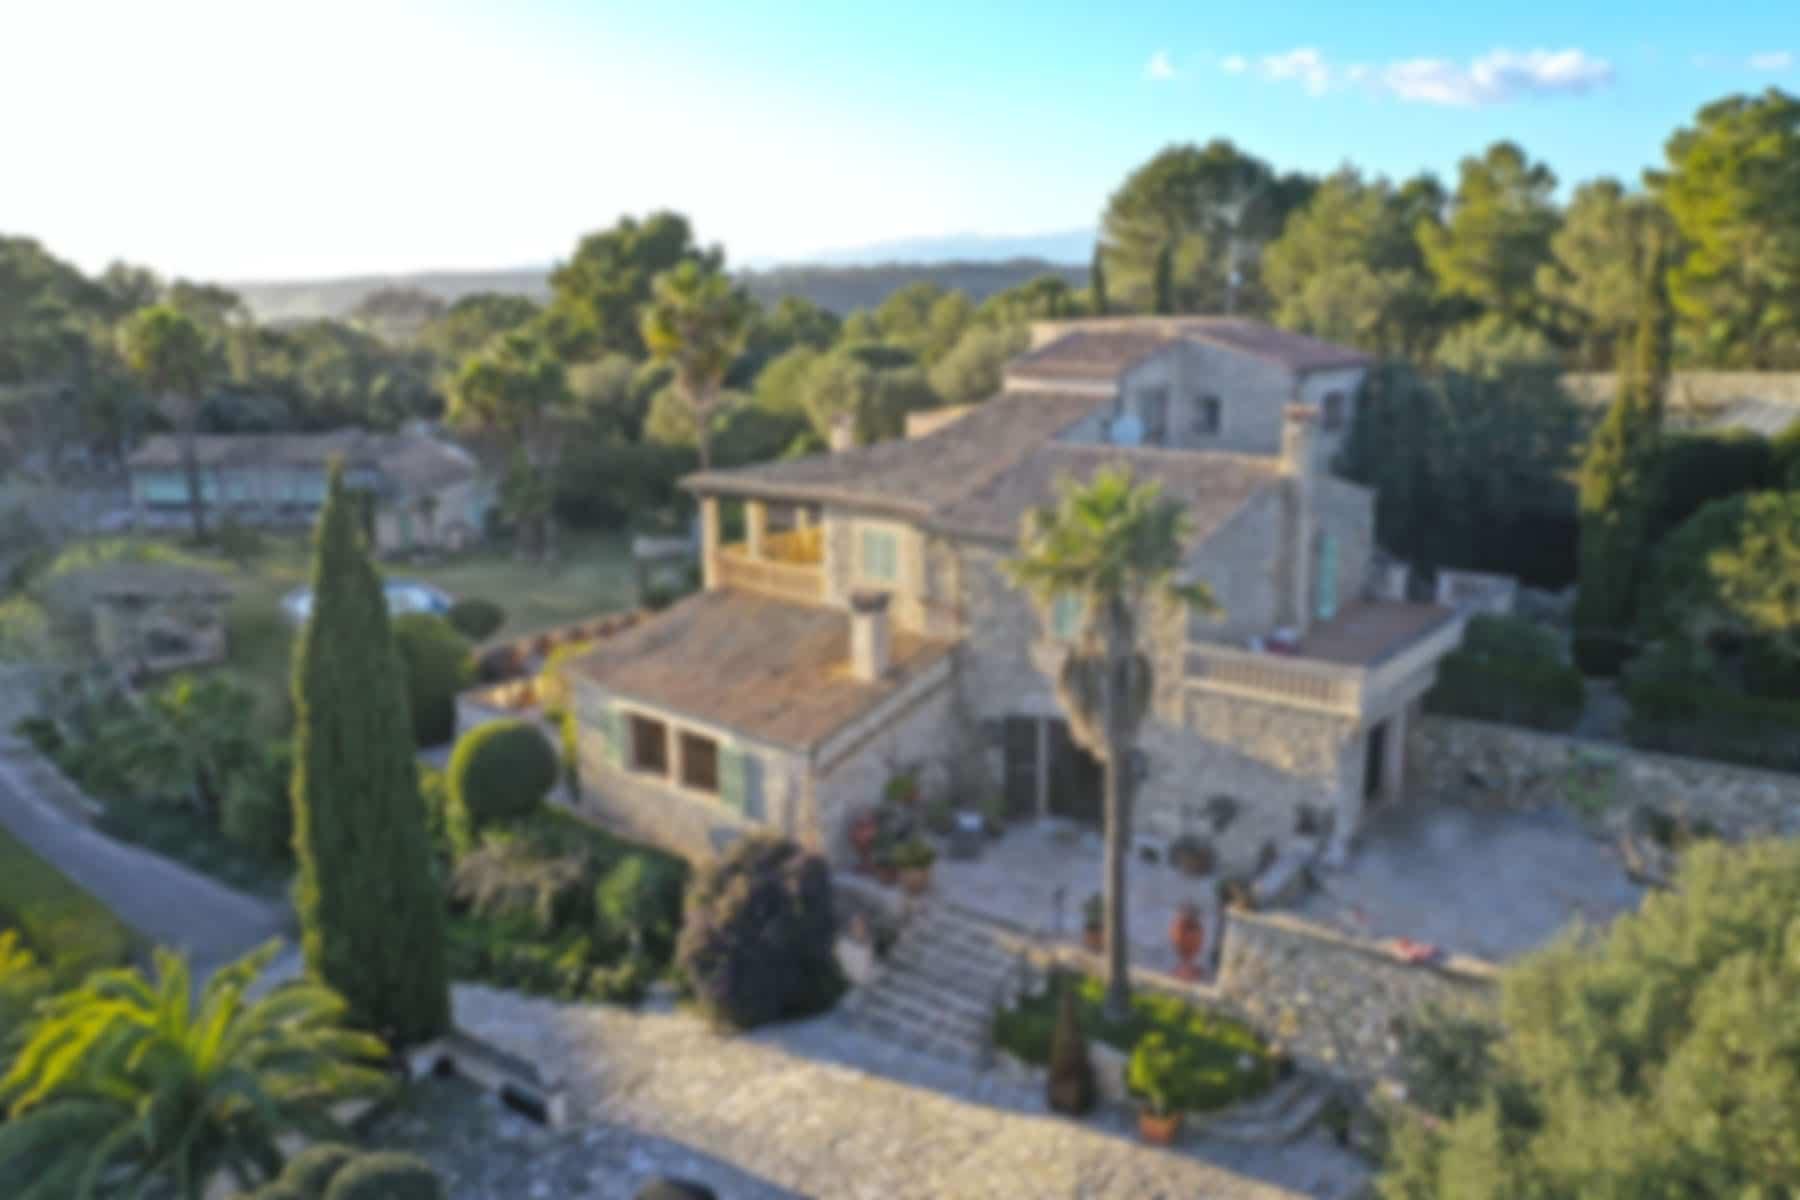 DISCRETE | Luxury finca in Montuiri with swimming pool on a hill